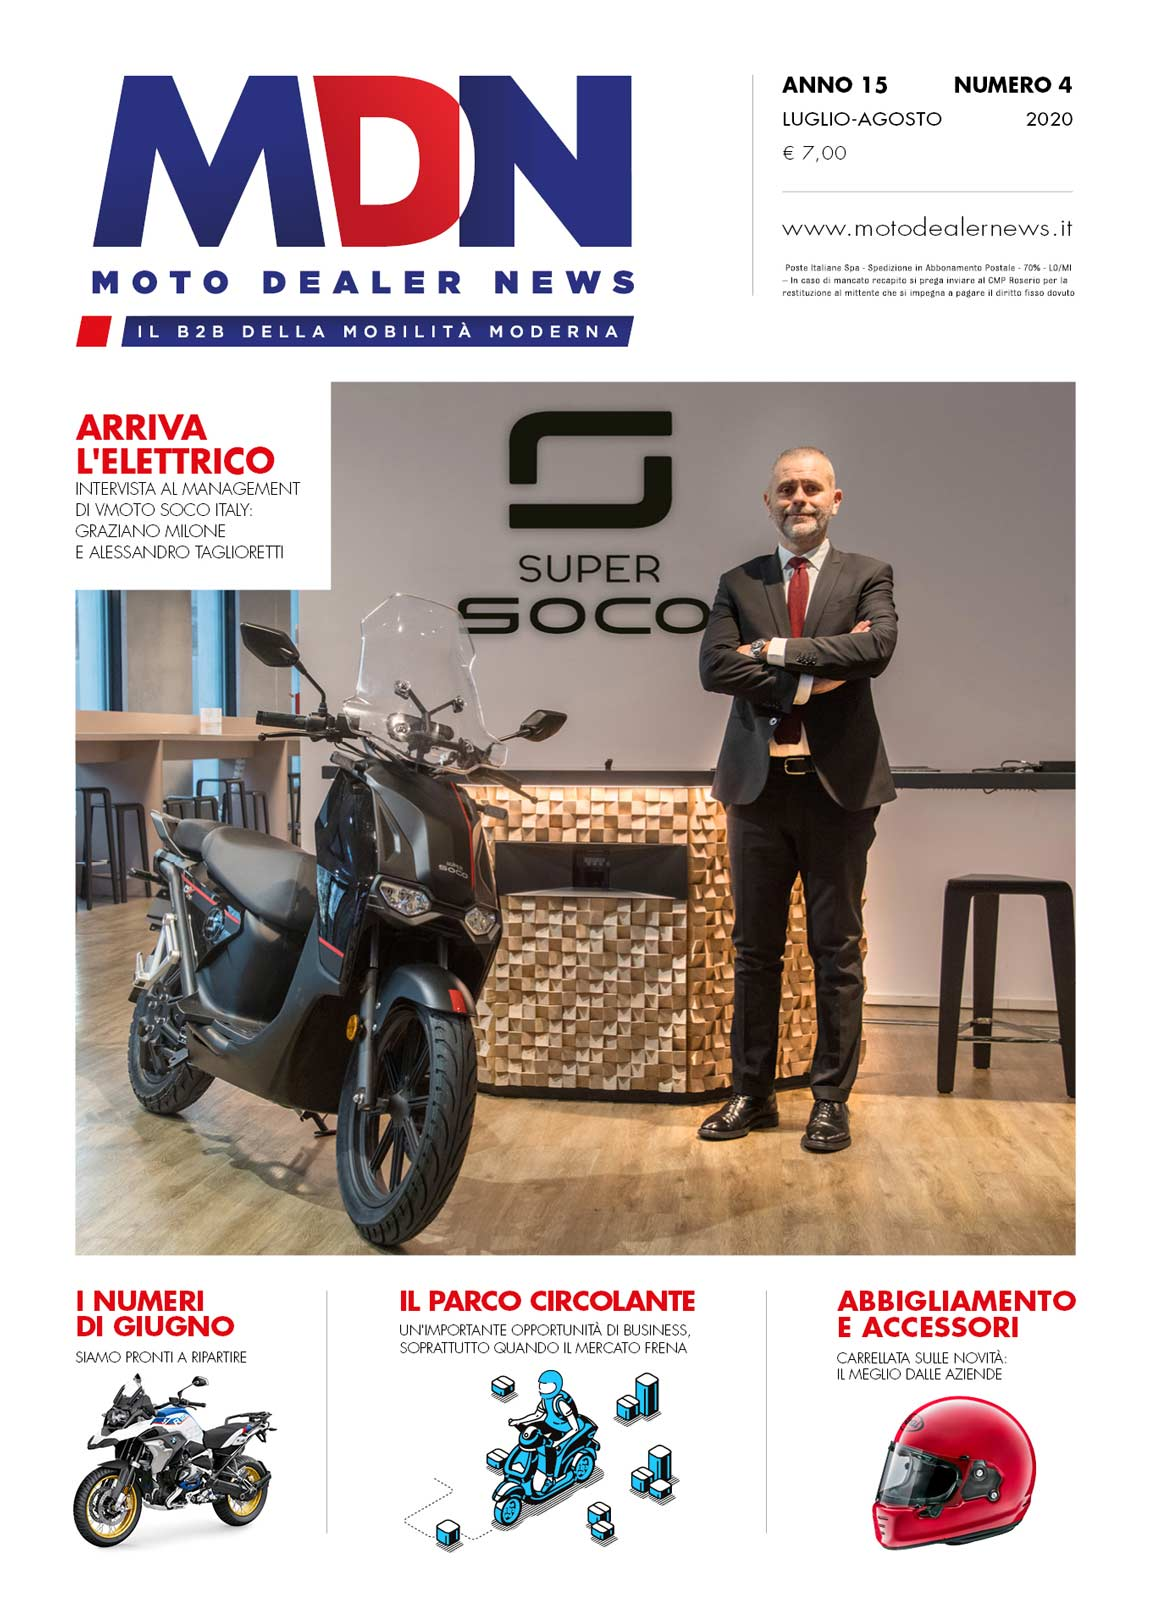 Moto Dealer News - luglio-agosto 2020